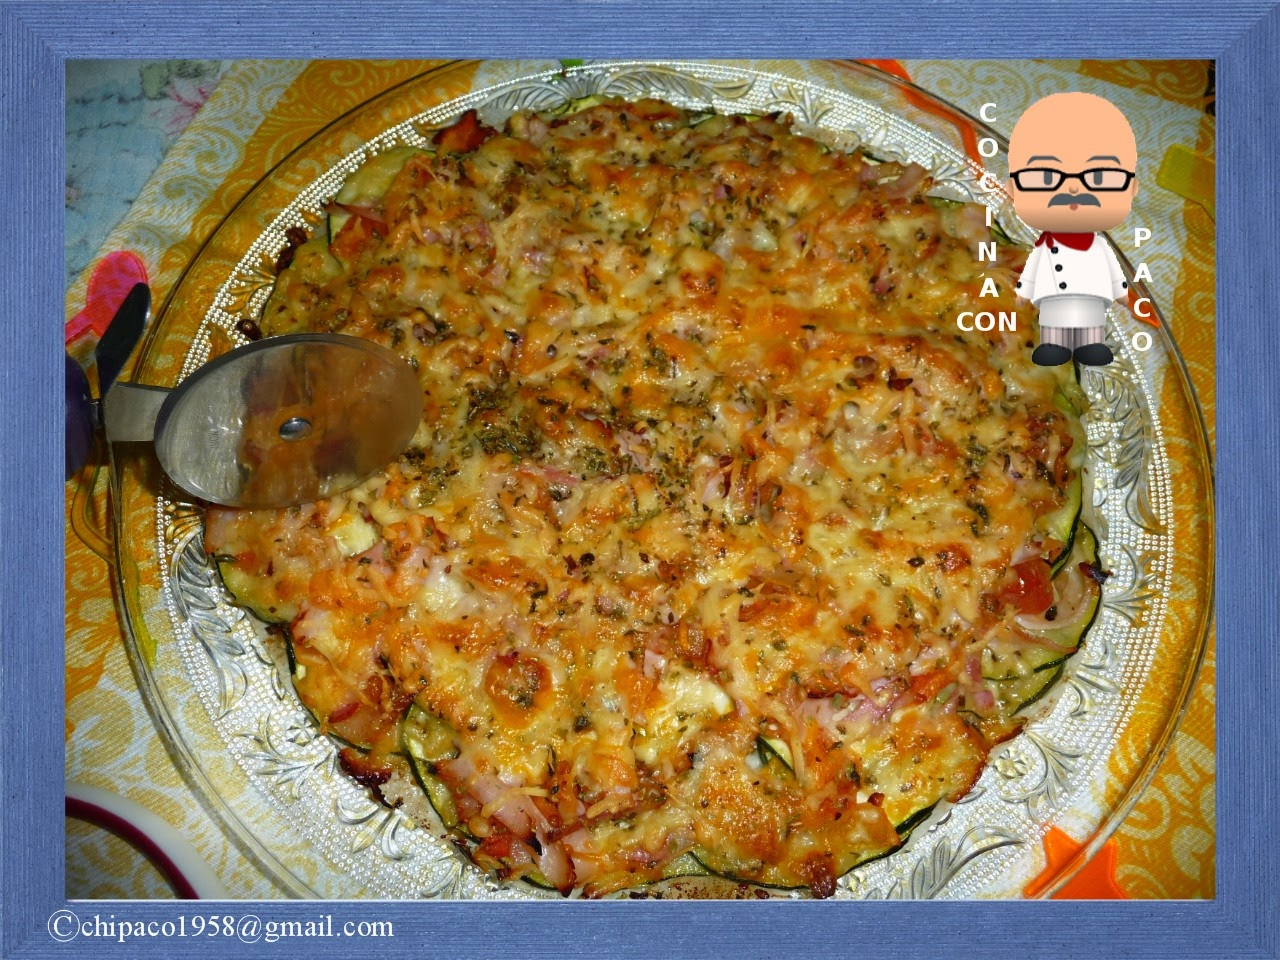 Cocina con paco pizza de calabac n - Cocina con paco ...